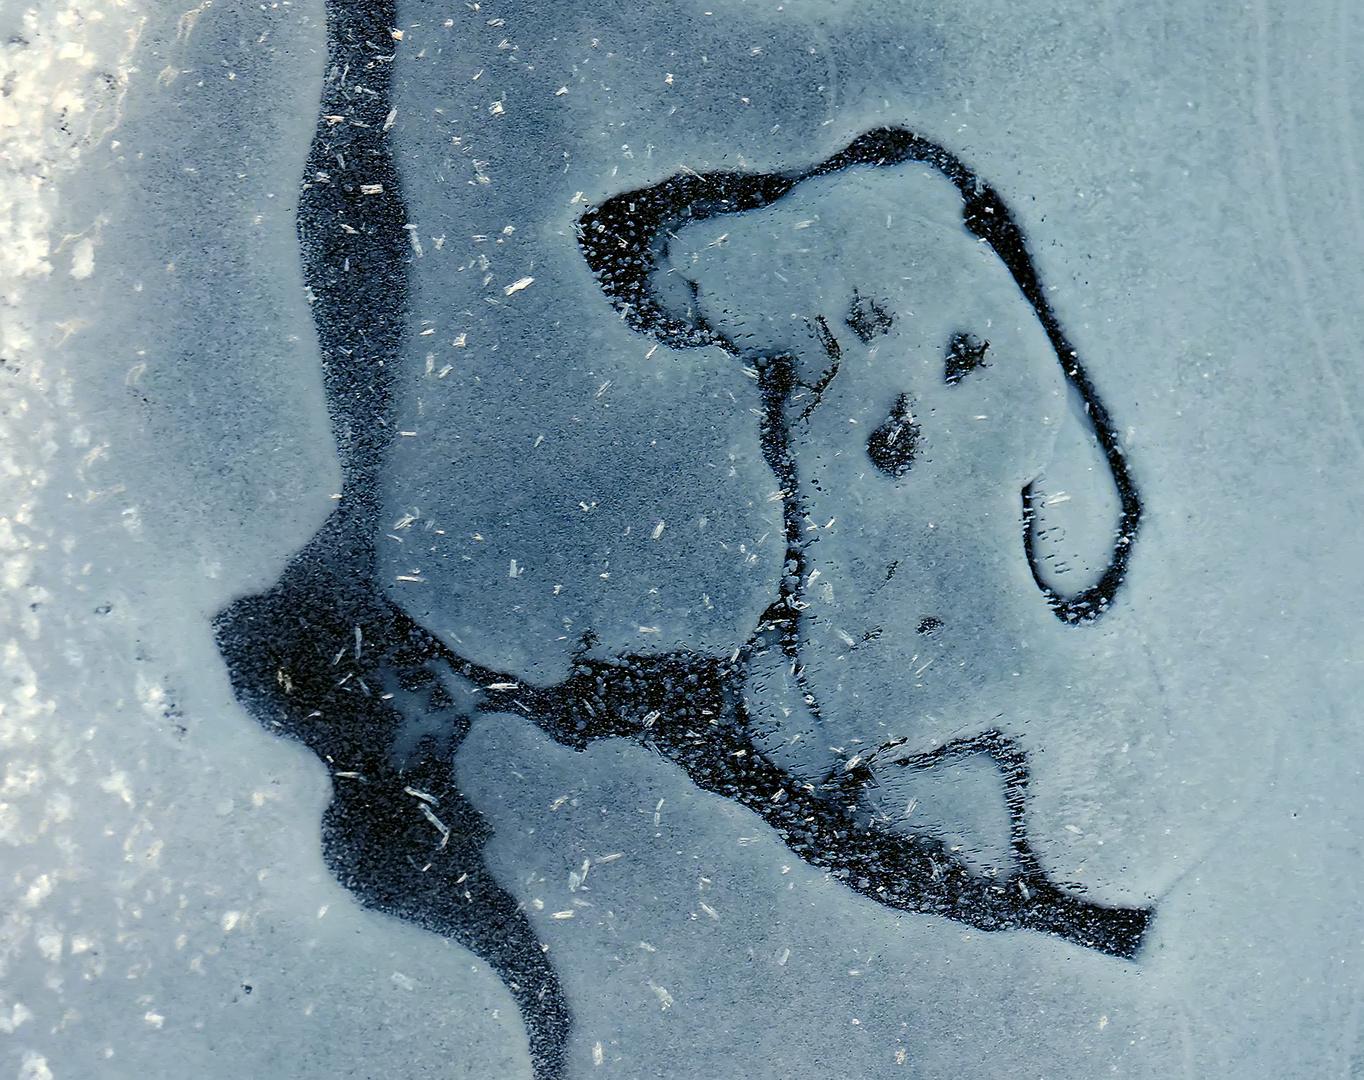 Hallo, hallo: Der Winter lässt euch grüssen!  -  Bonjour, l'hiver vous salue!